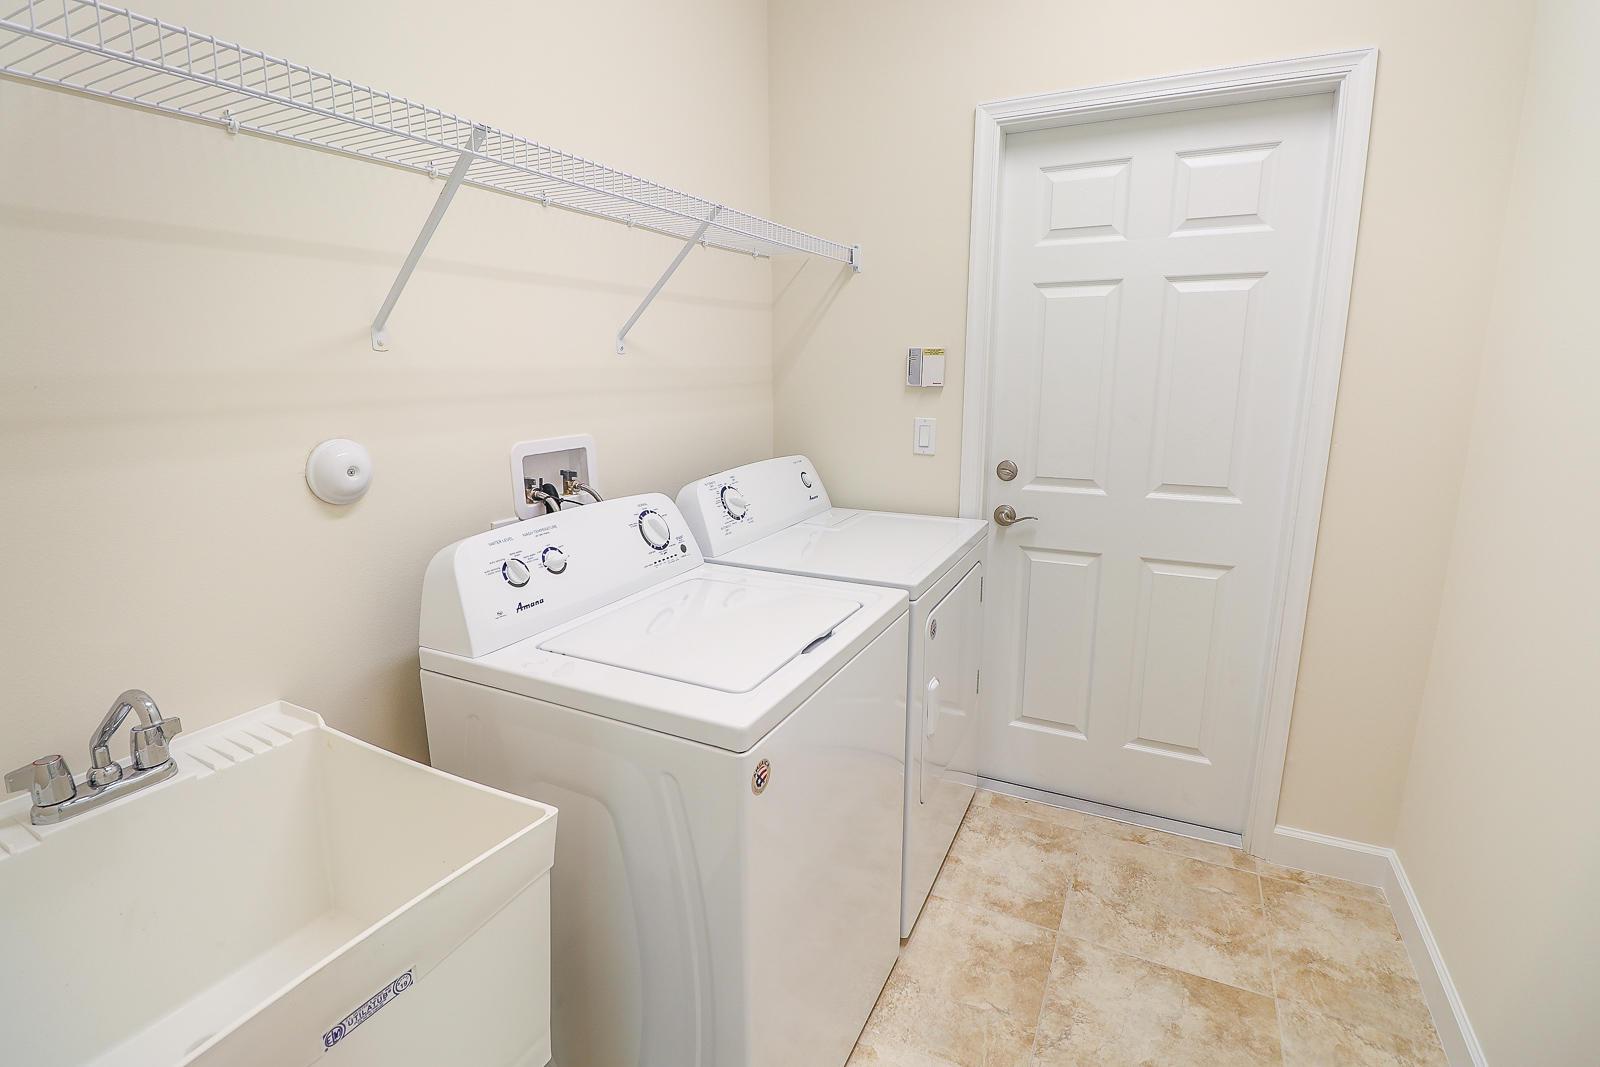 33-Laundry Room